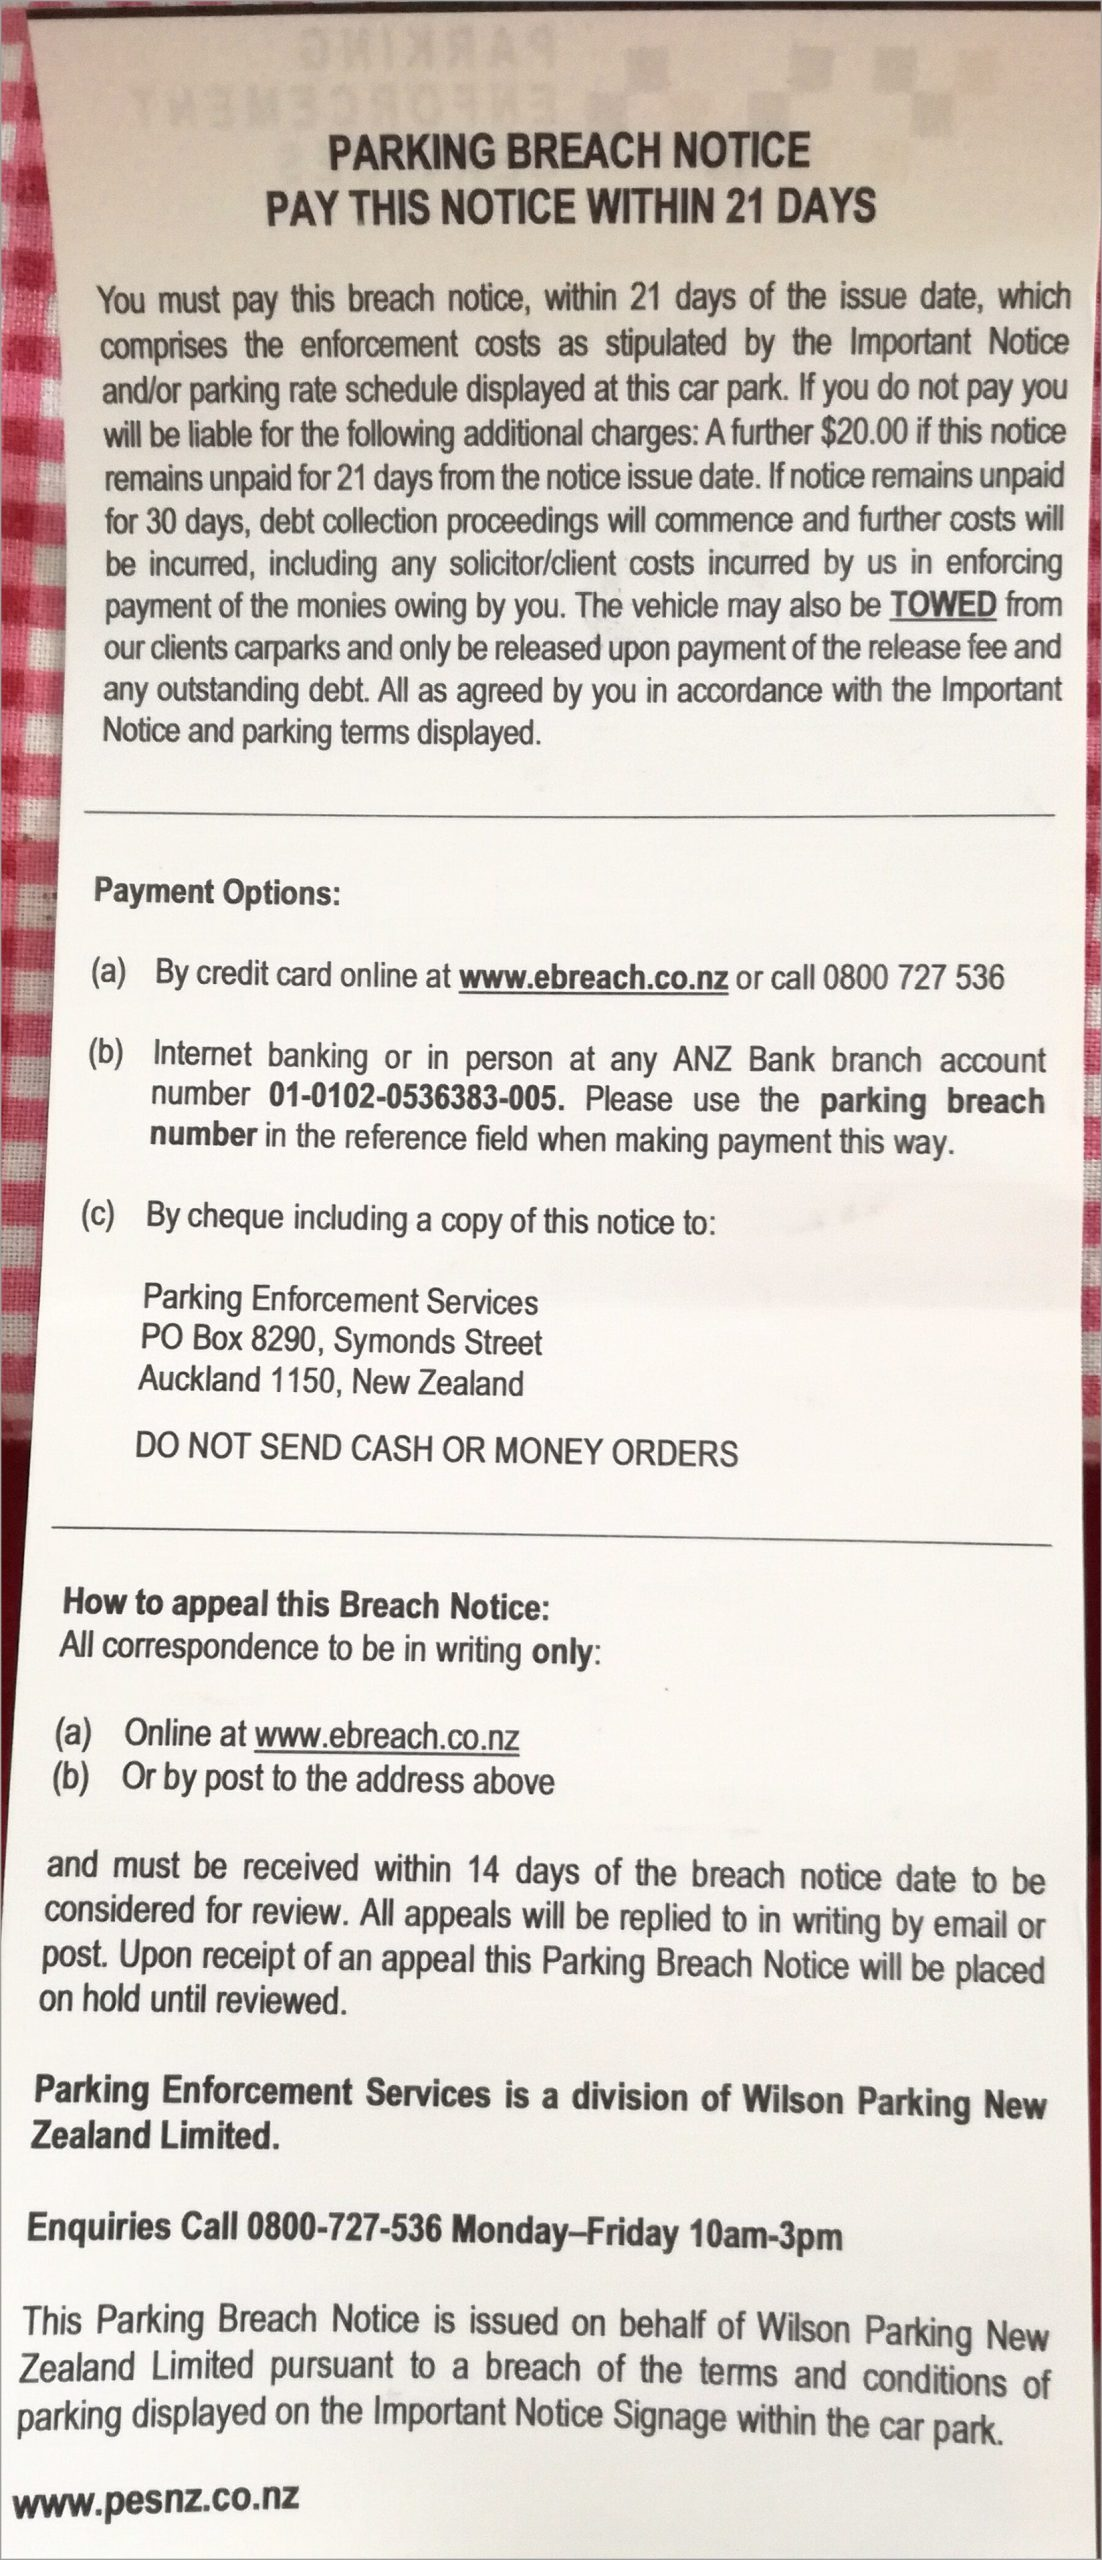 will an ebreach parking ticket from a westfield atsto